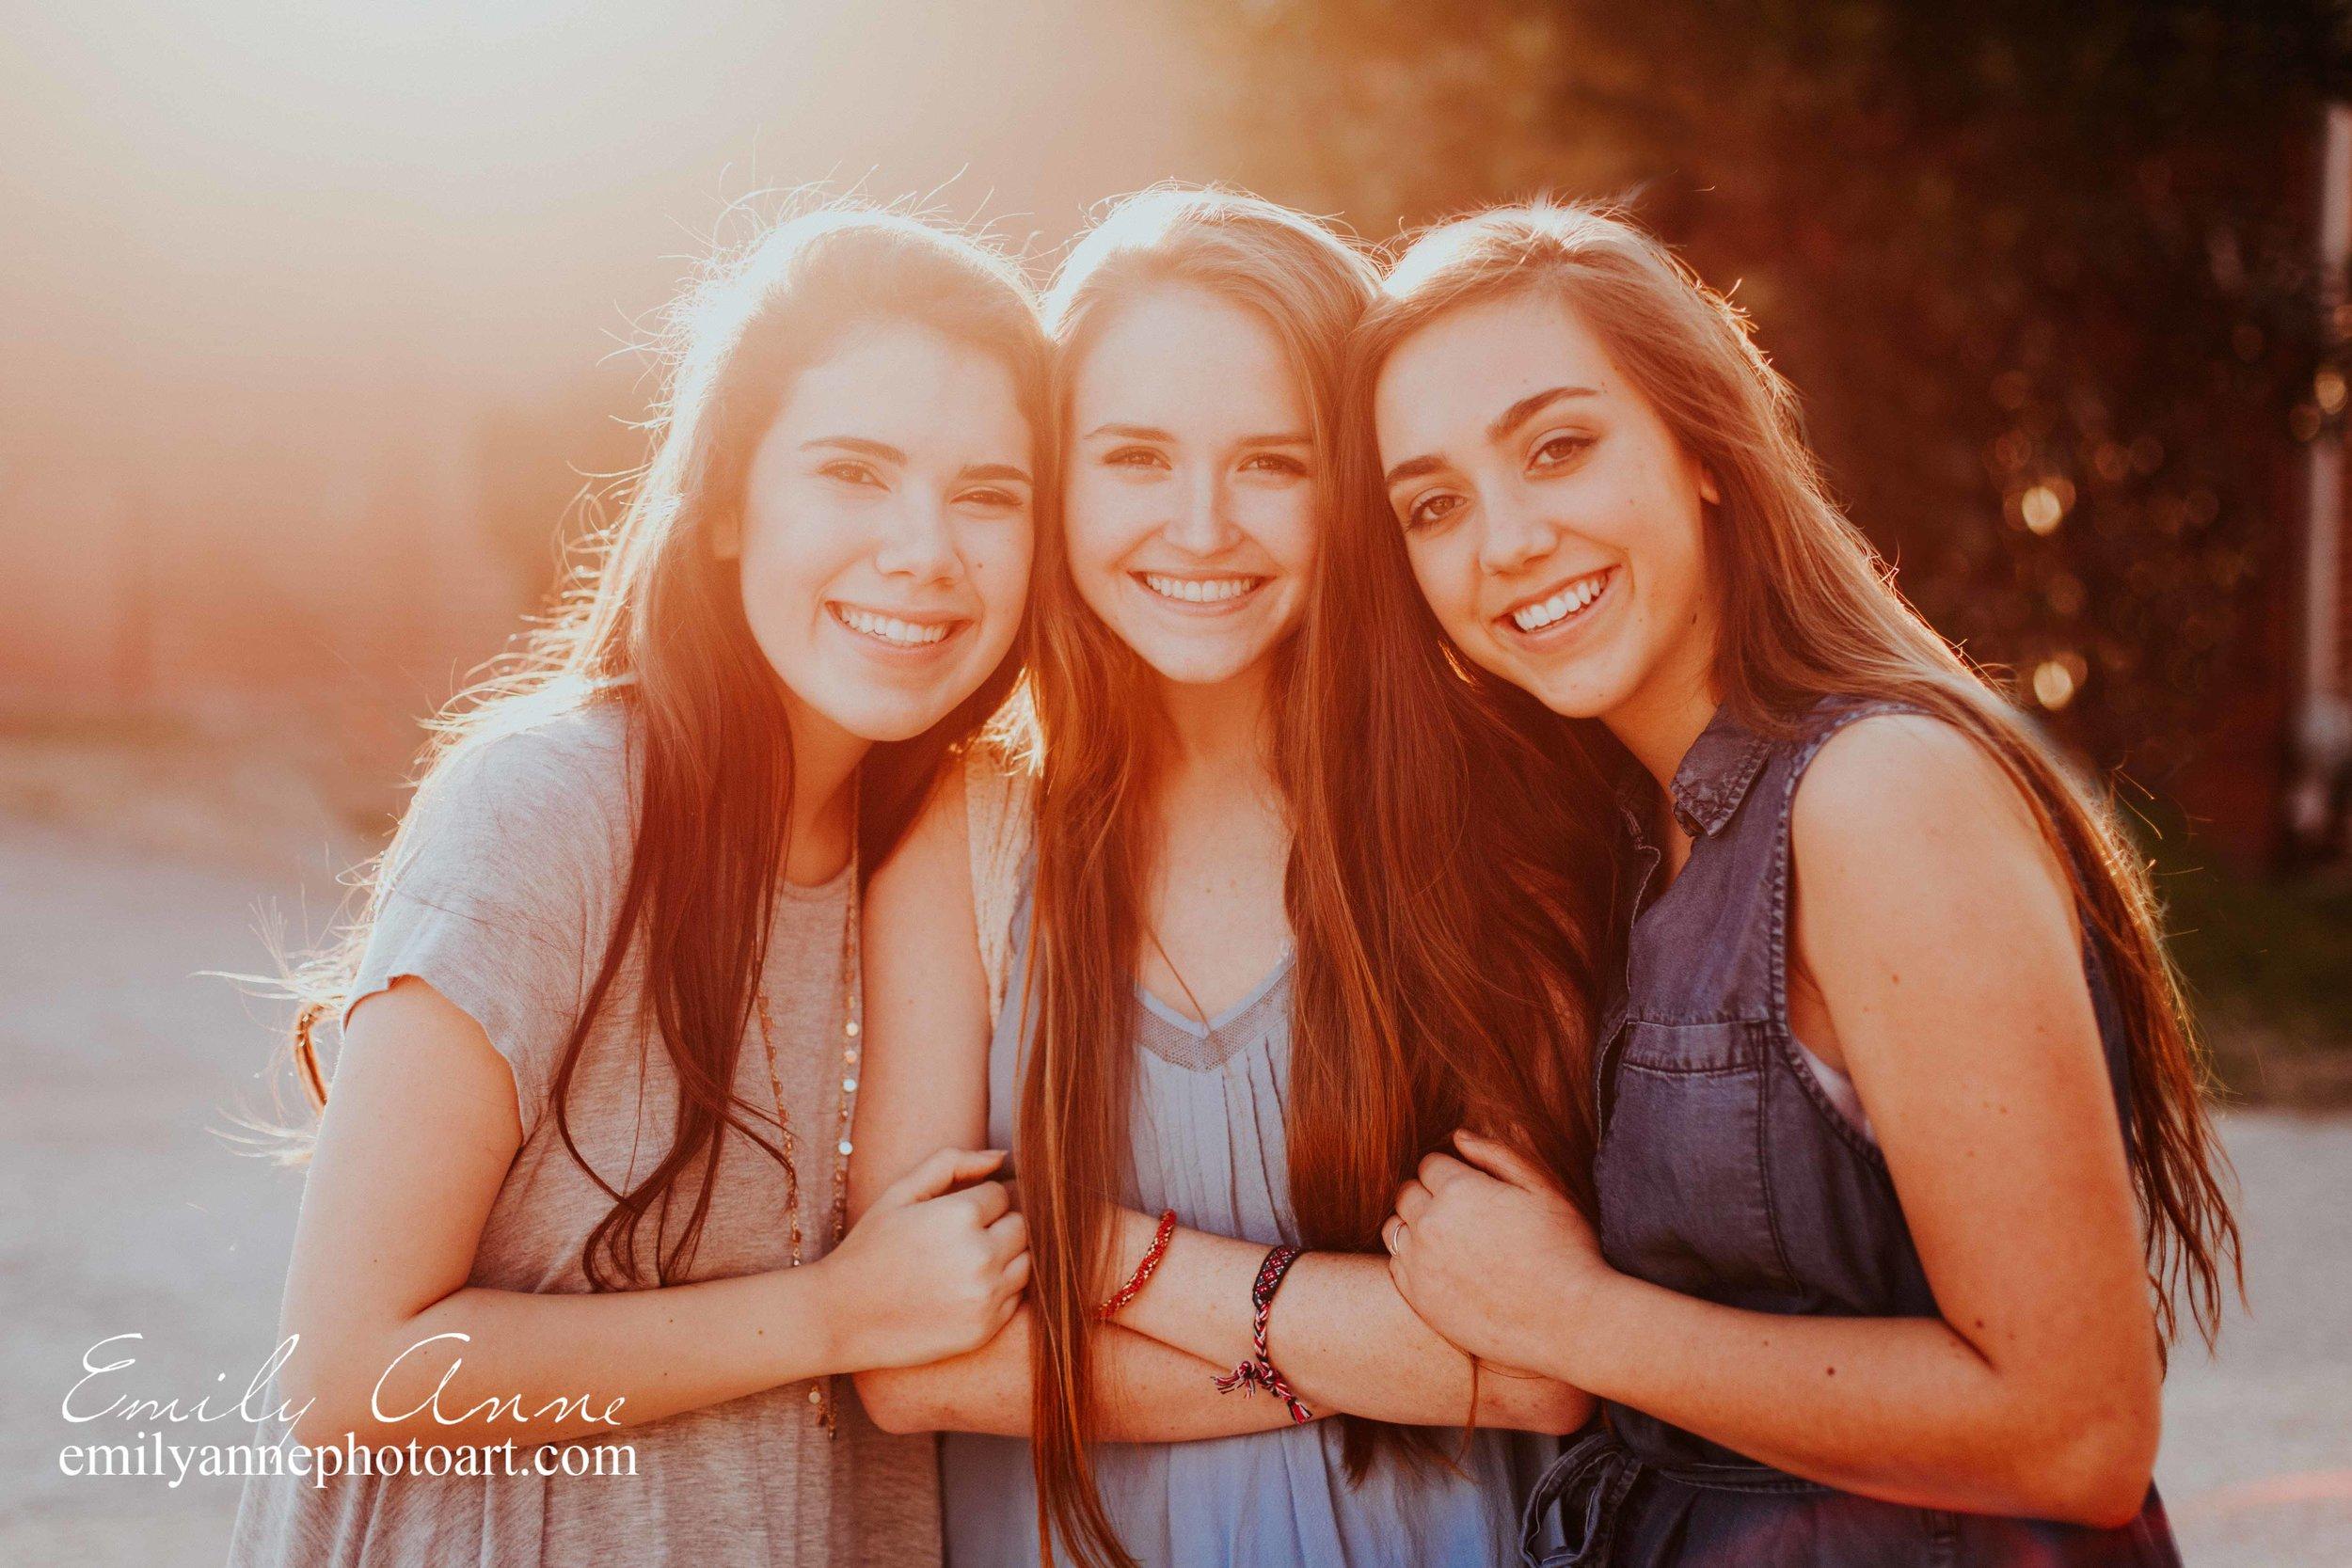 best senior portrait photographer team eighteen class of 2018 Senior portrait photographer